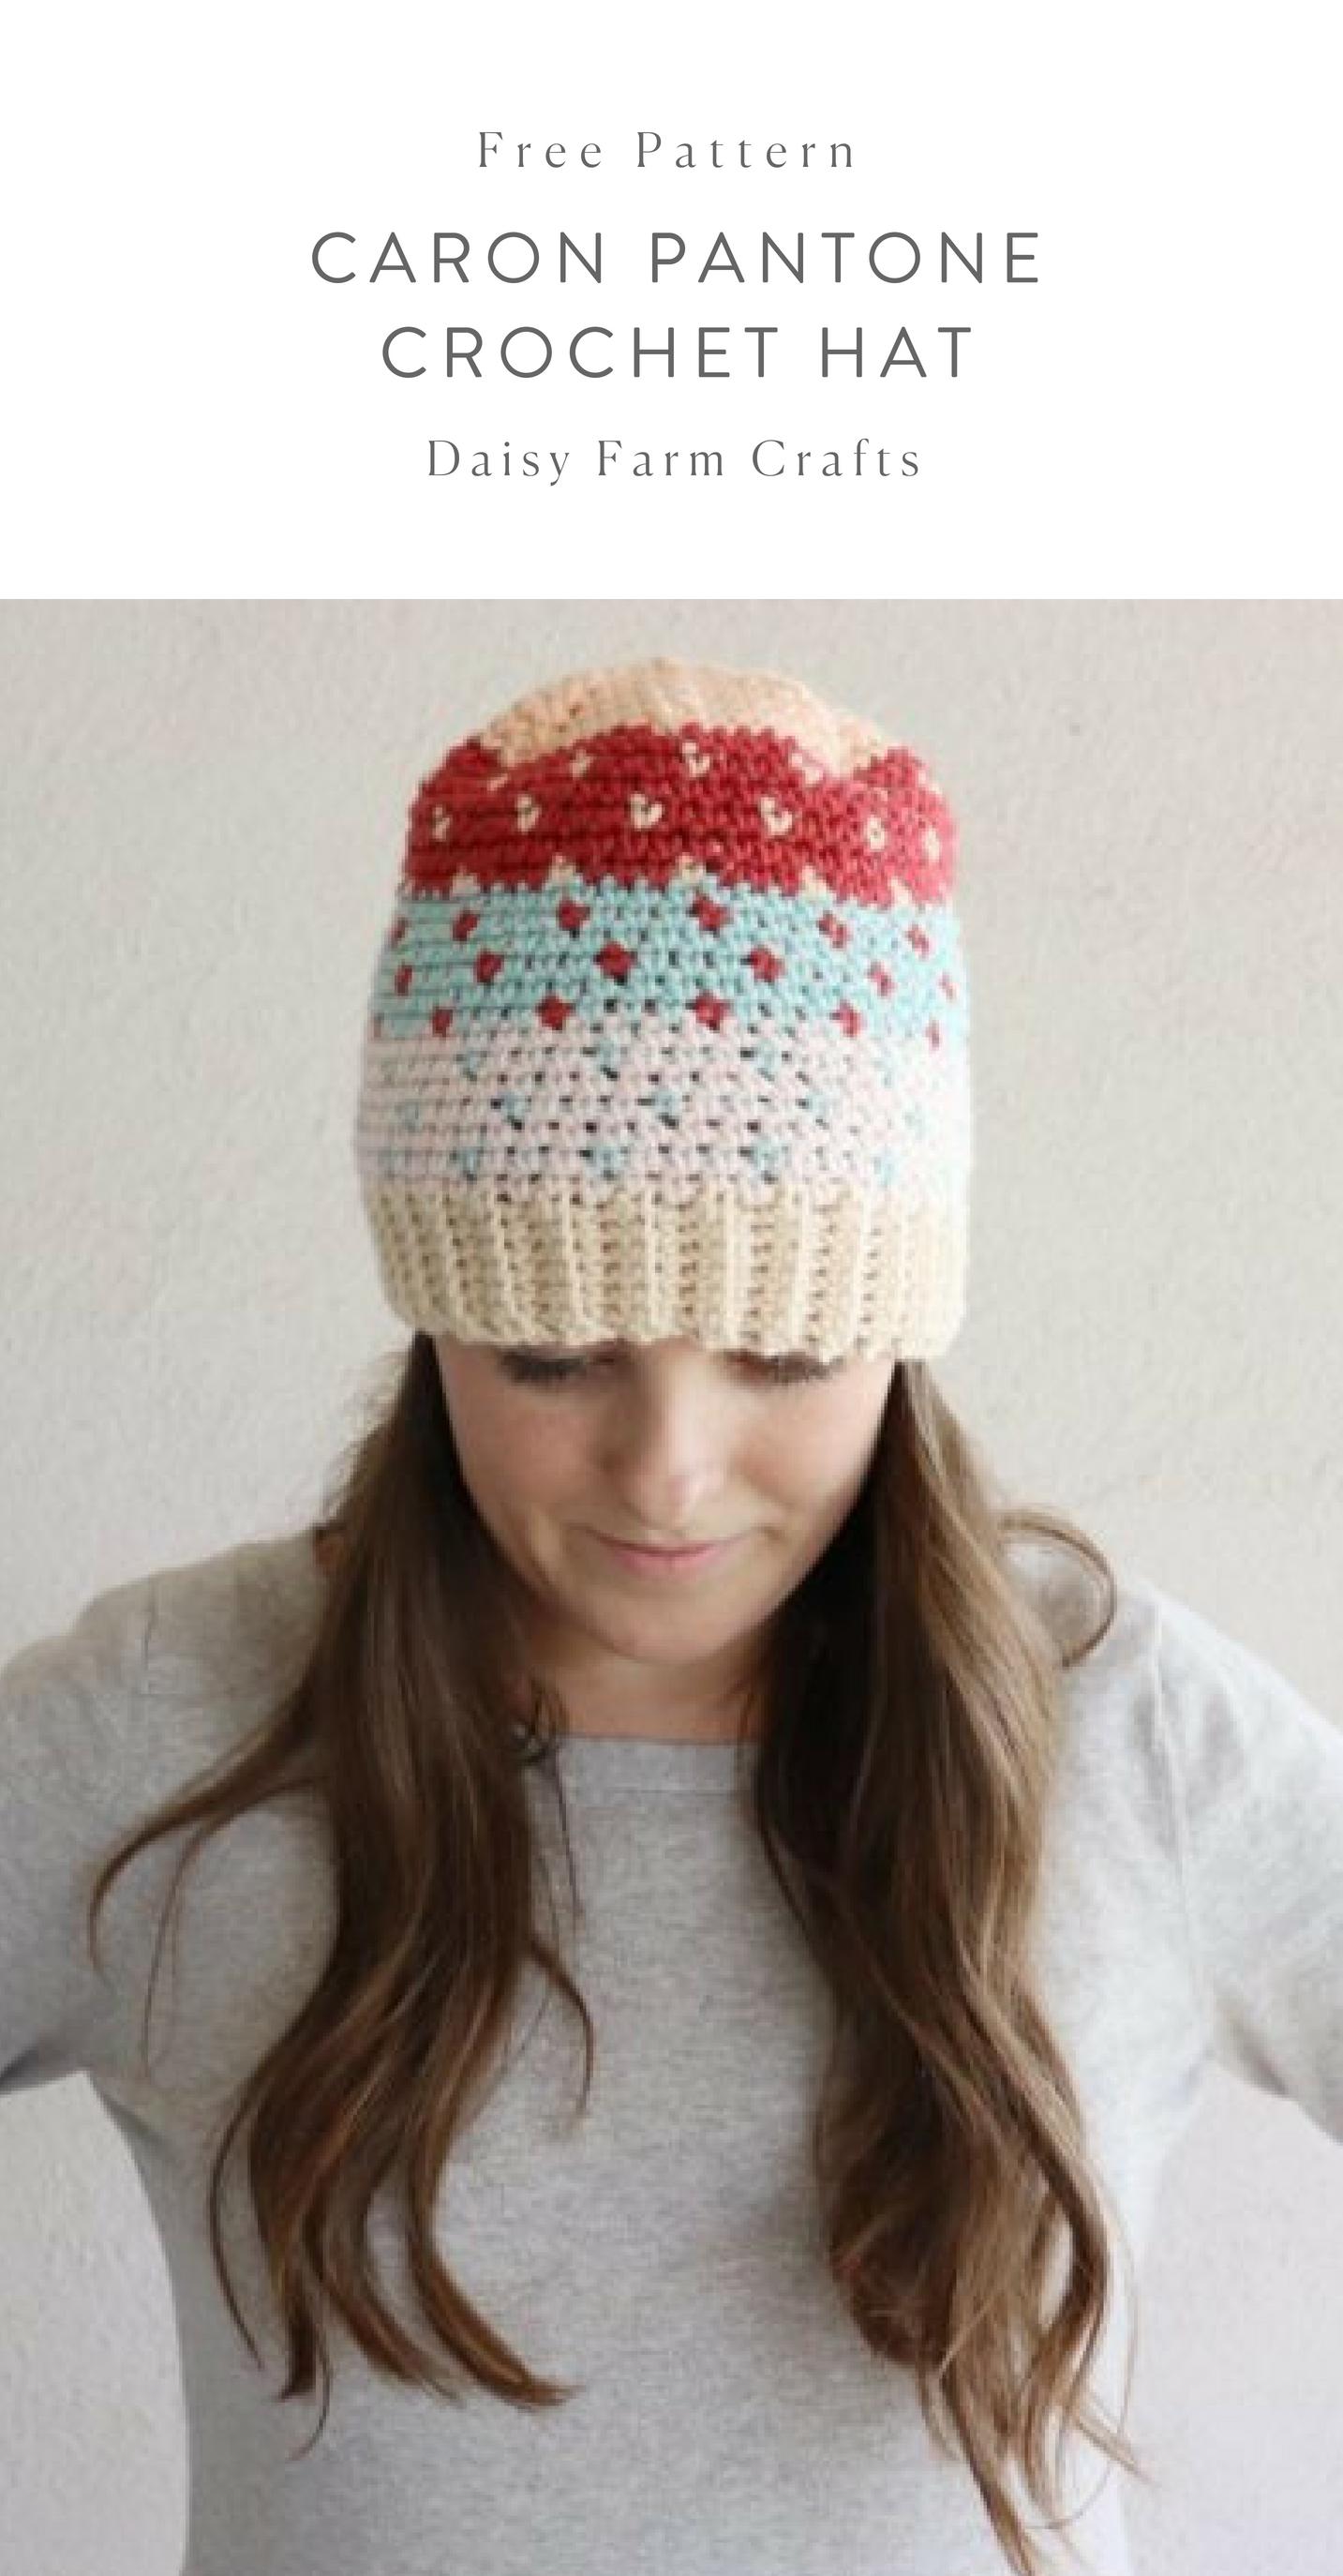 97e86122871 Free Pattern - Caron Pantone Crochet Hat  crochet